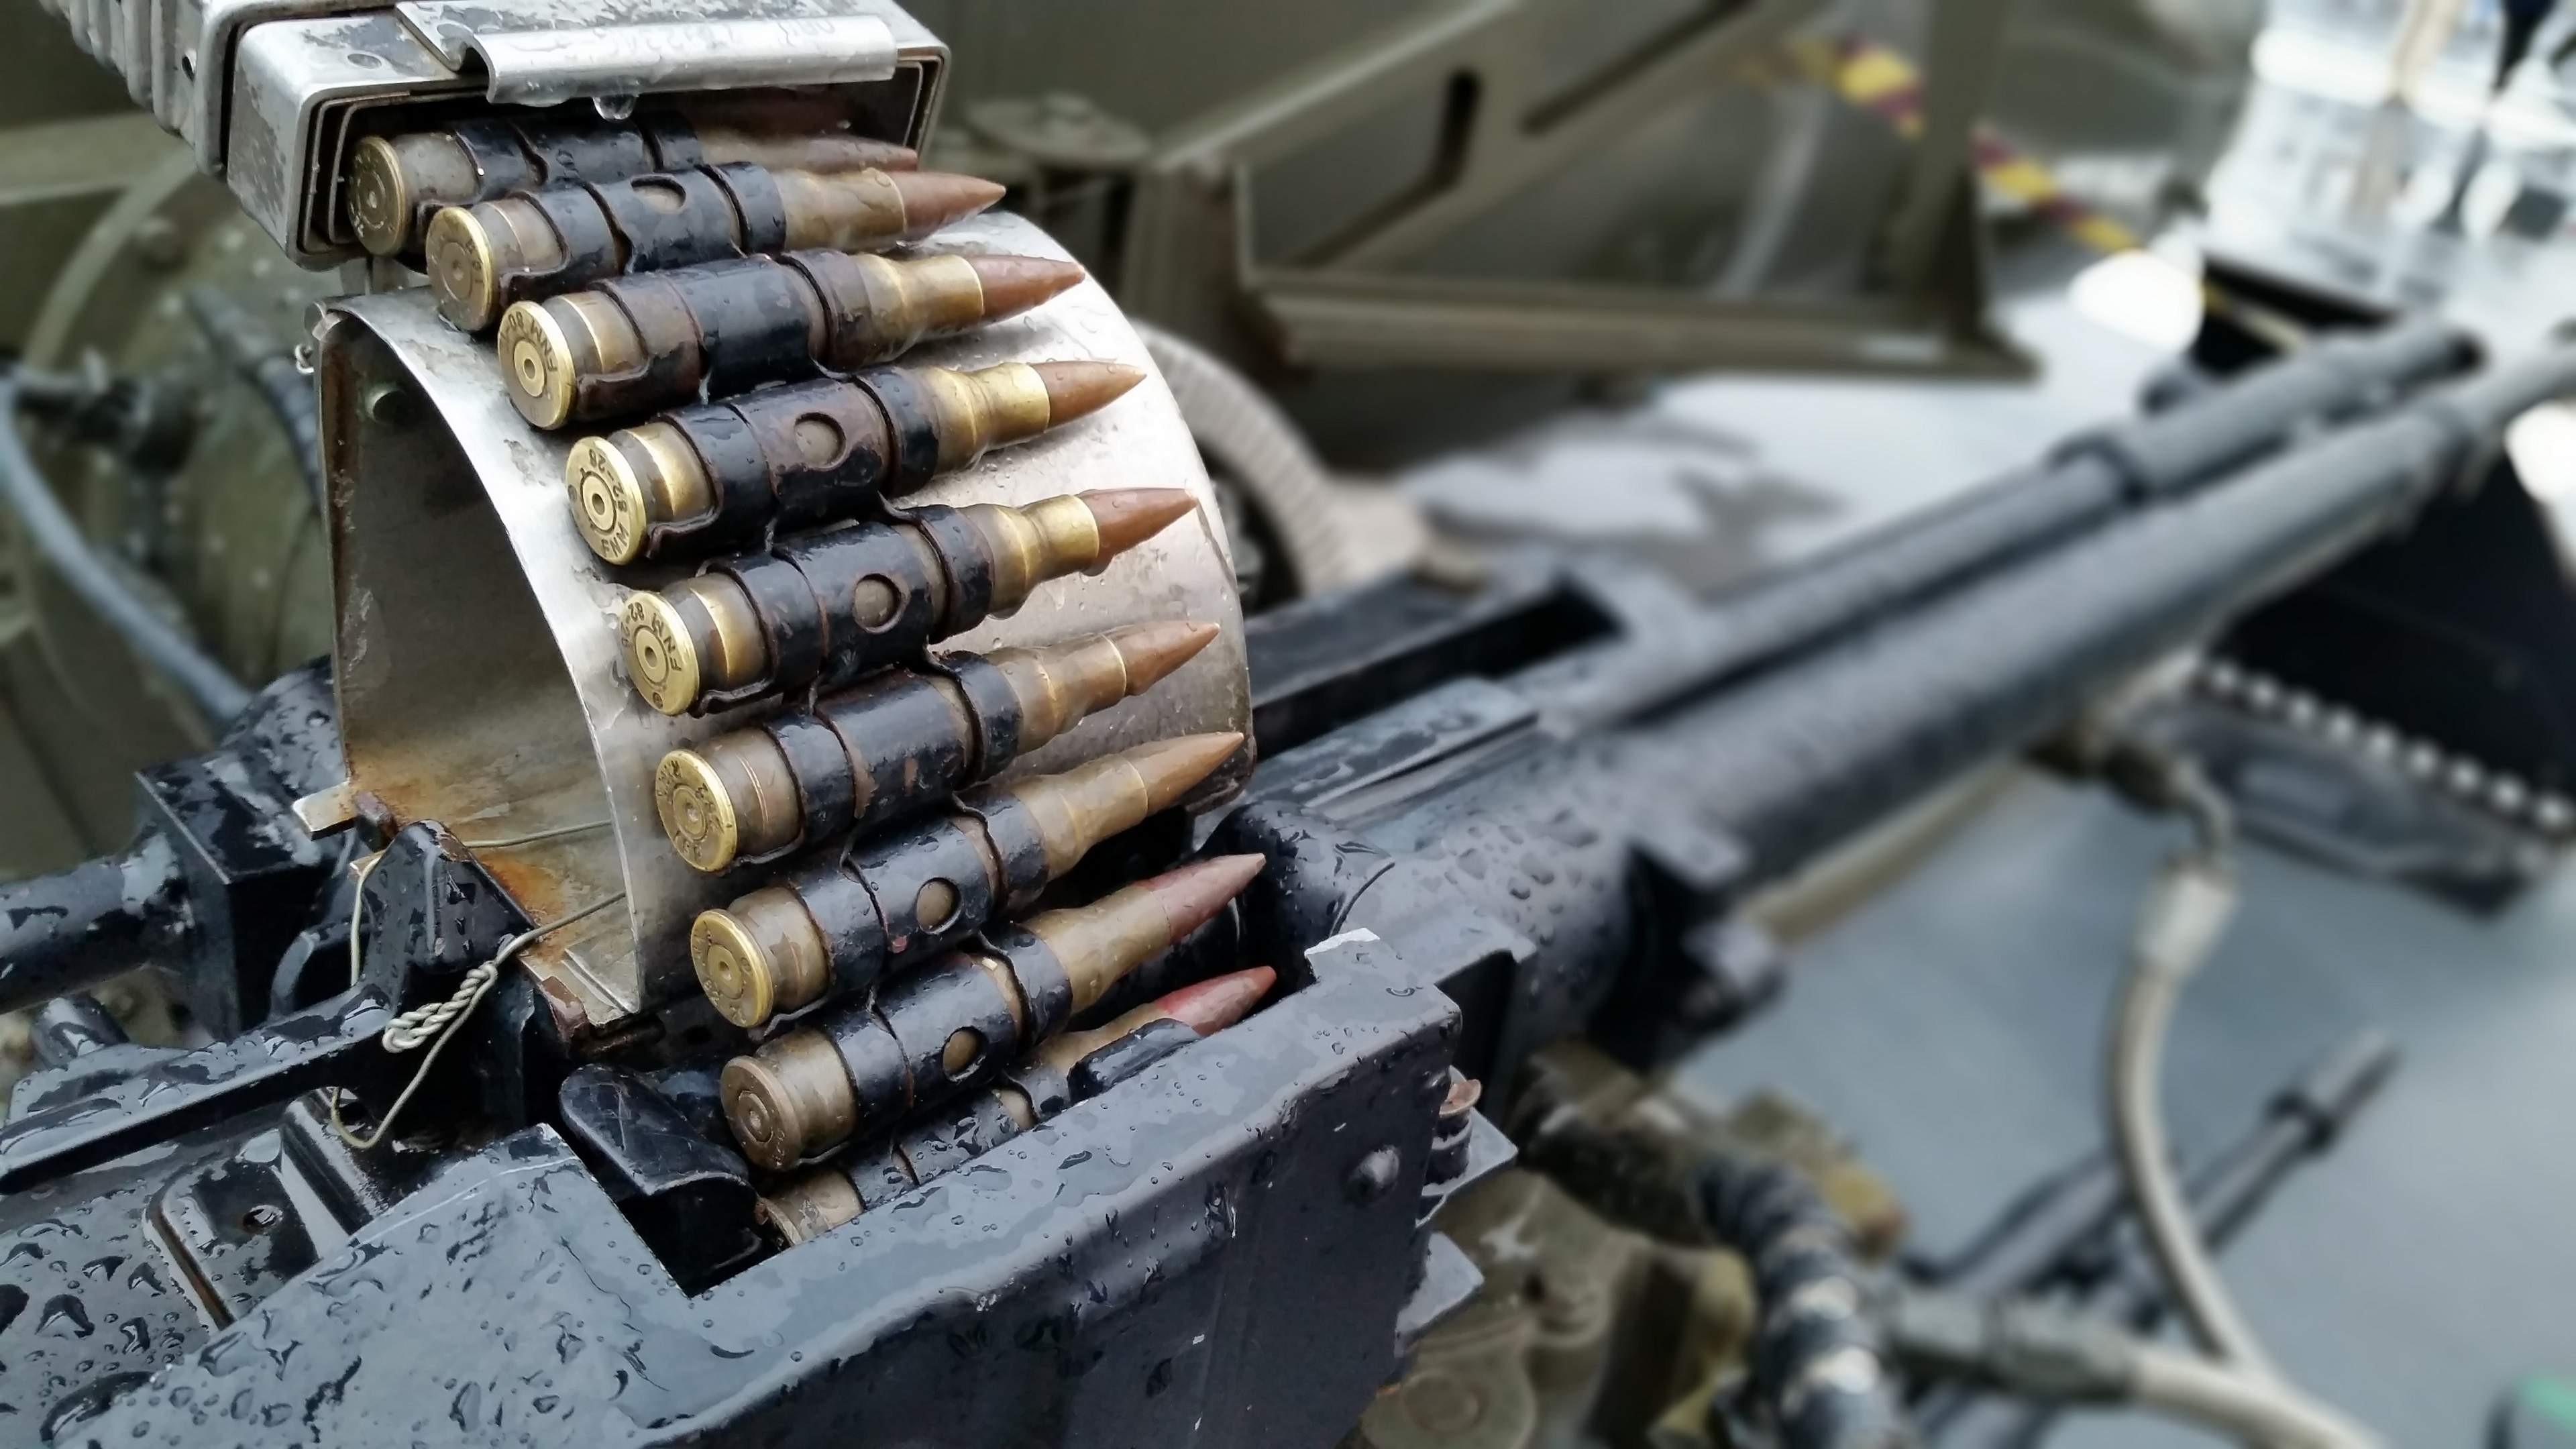 Army Arsenal Machine Gun And Bullets 4k Wallpaper Ultra Hd